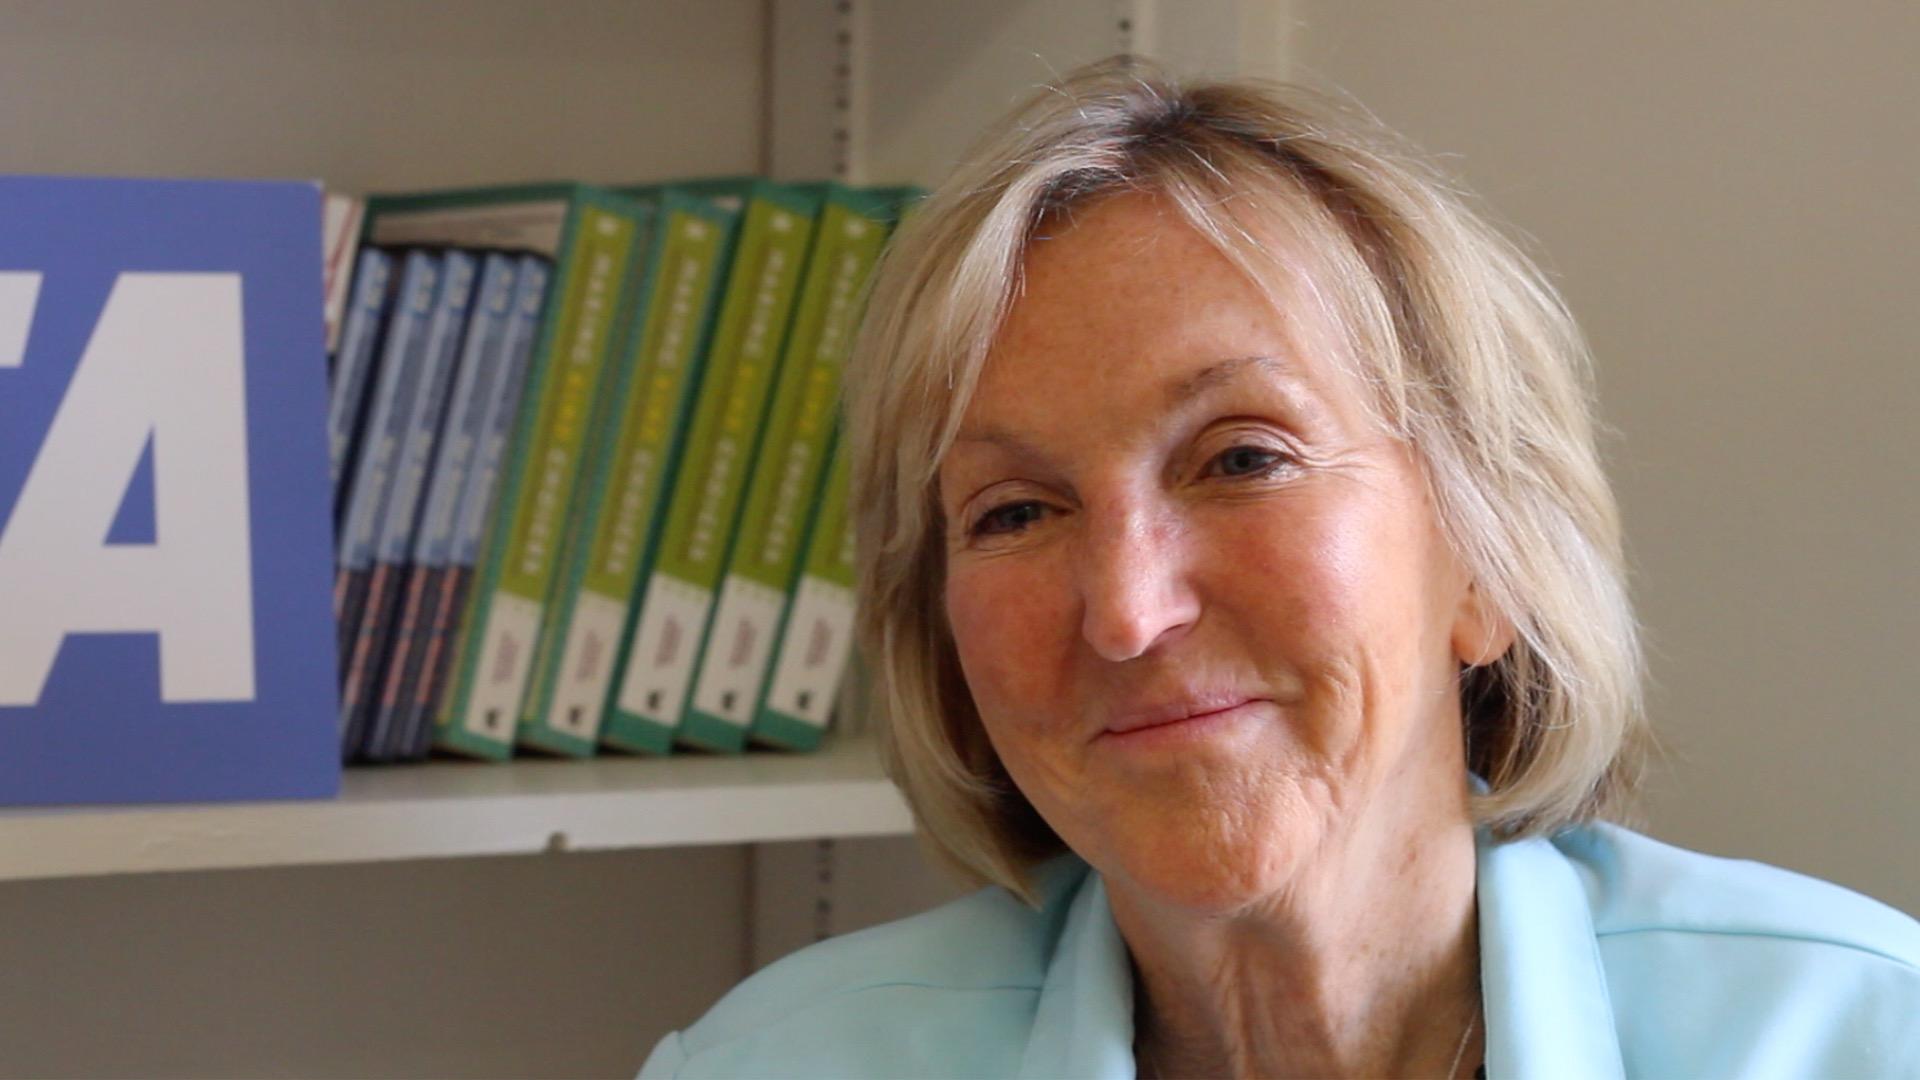 Ingrid Newkirk   Founder, PETA